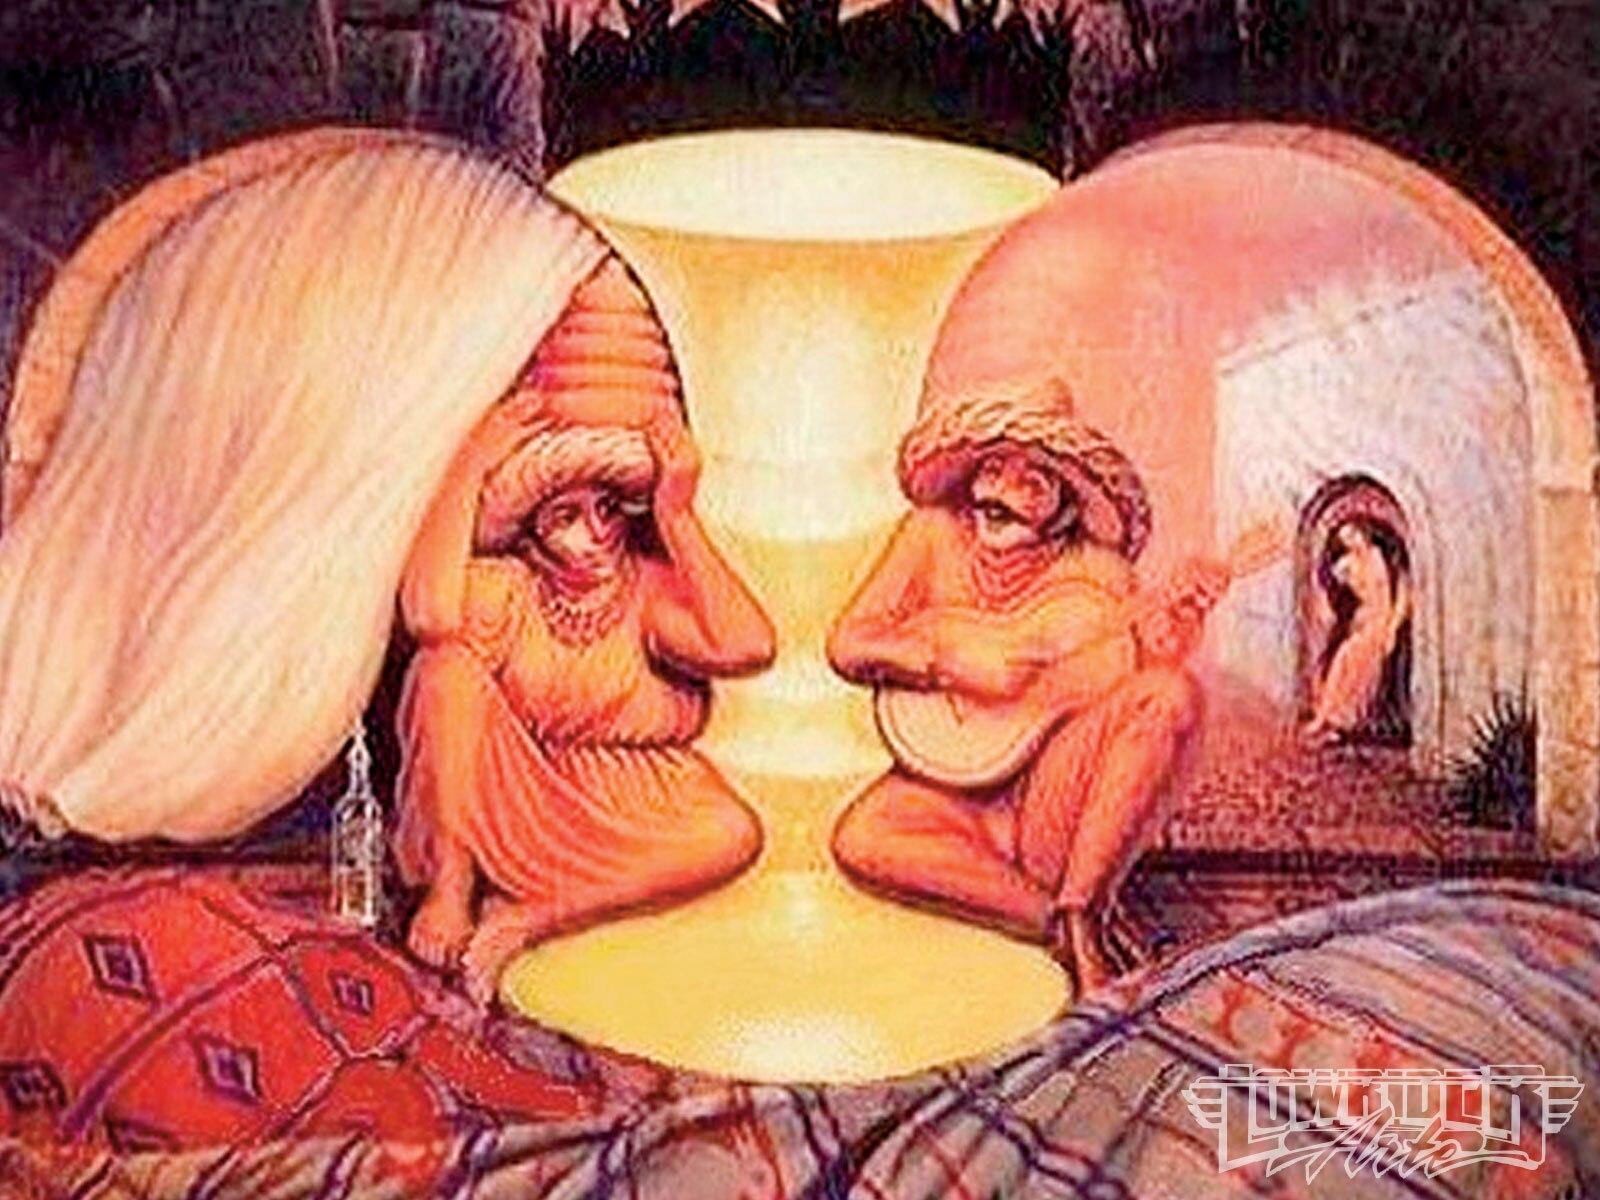 1001-lrap-09-o-octavio-ocampo-metamorphosis-art-old-people3